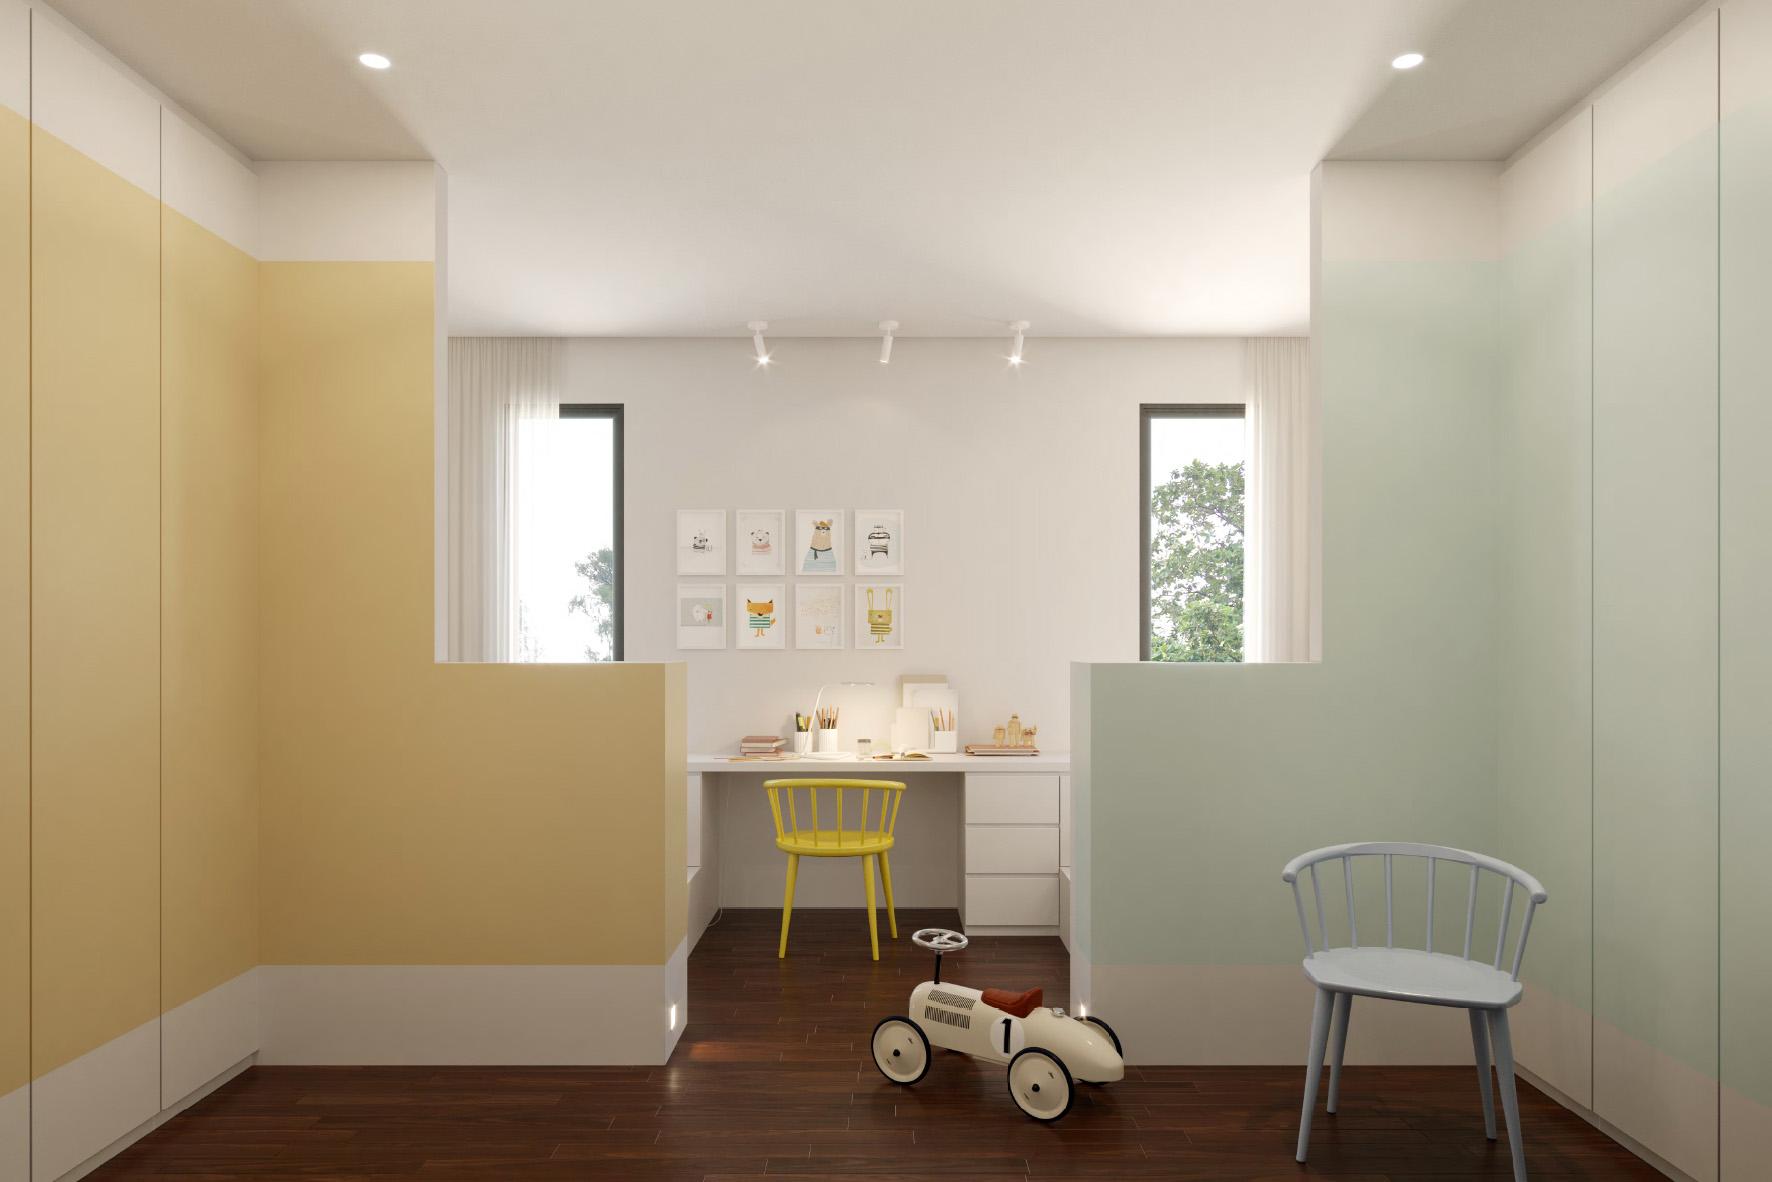 LV406 Bedroom 5